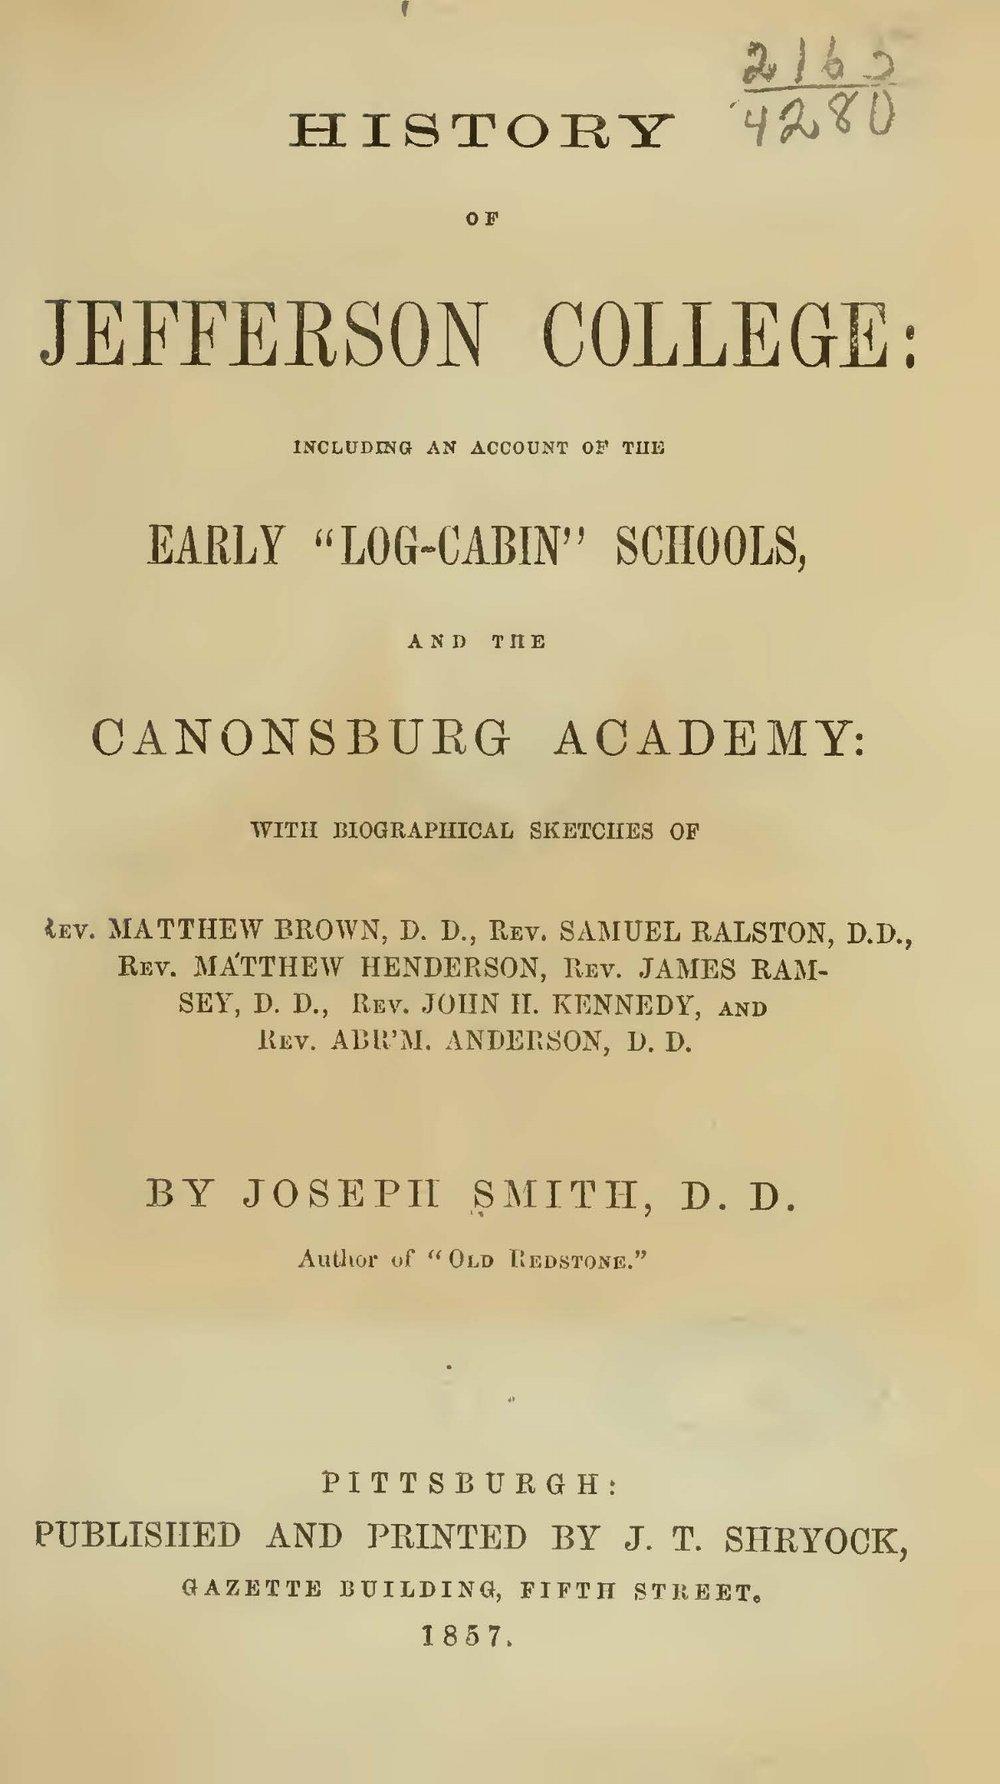 Smith, Joseph, History of Jefferson College Title Page.jpg